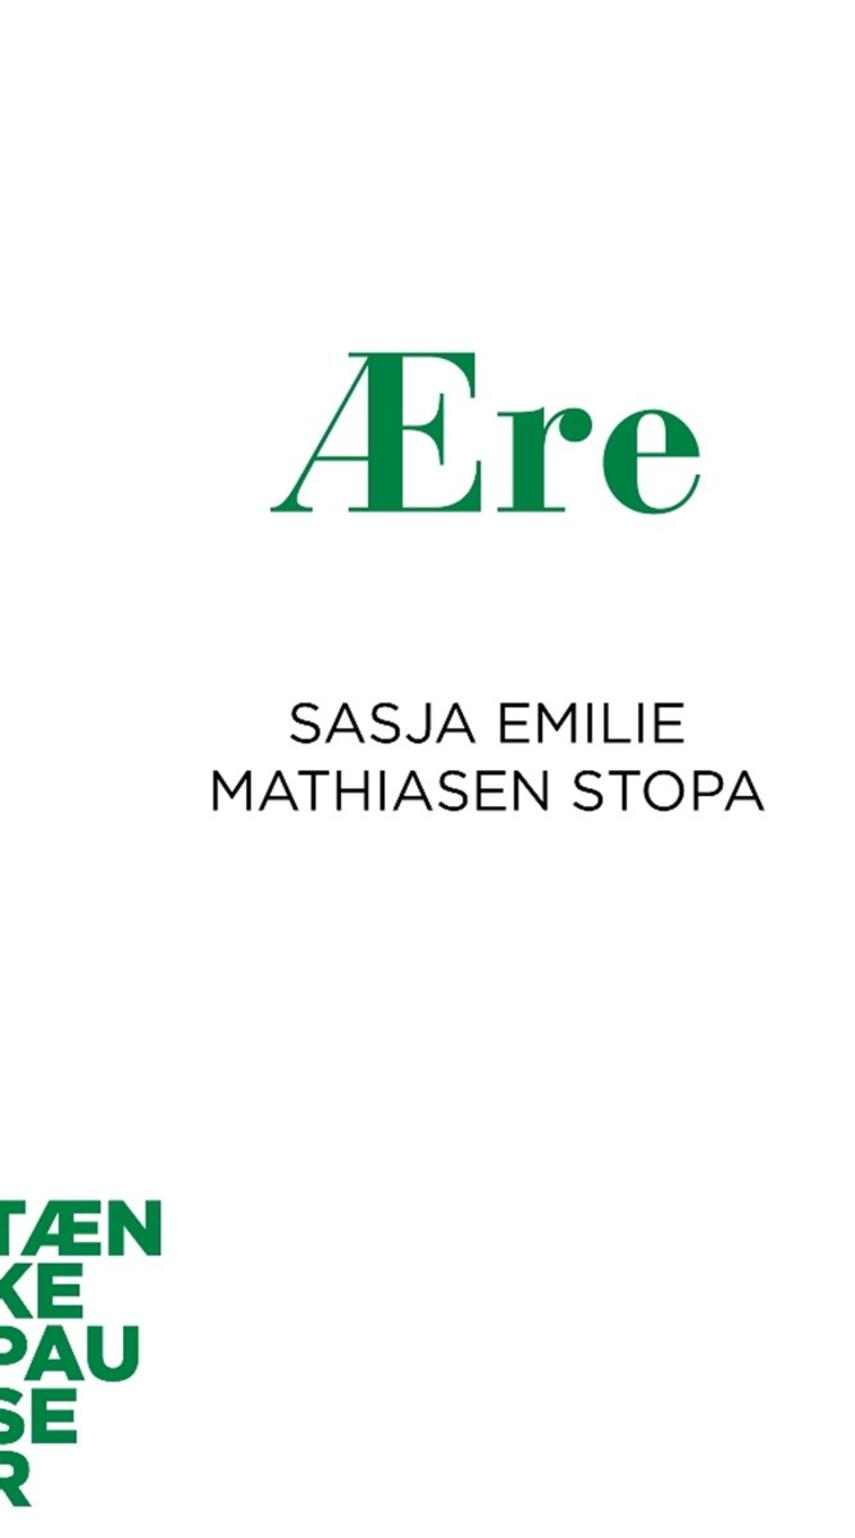 Sasja Emilie Mathiasen Stopa: Ære